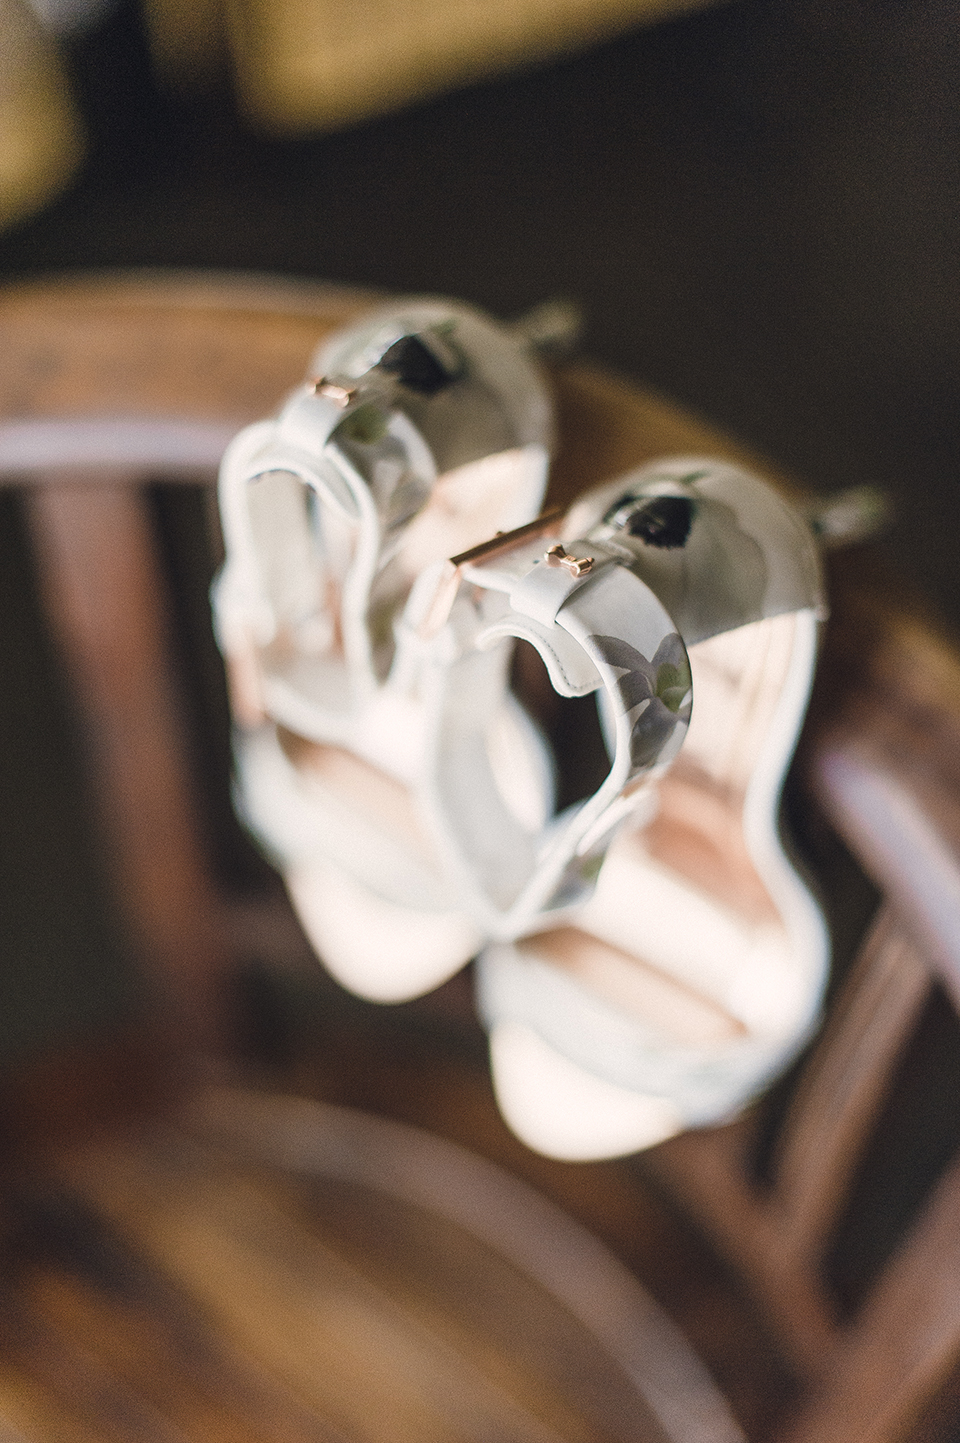 RyanParker_WeddingPhotographer_FineArt_CapeTown_Robertson_PatBusch_Hermanus_M&S_DSC_2882.jpg